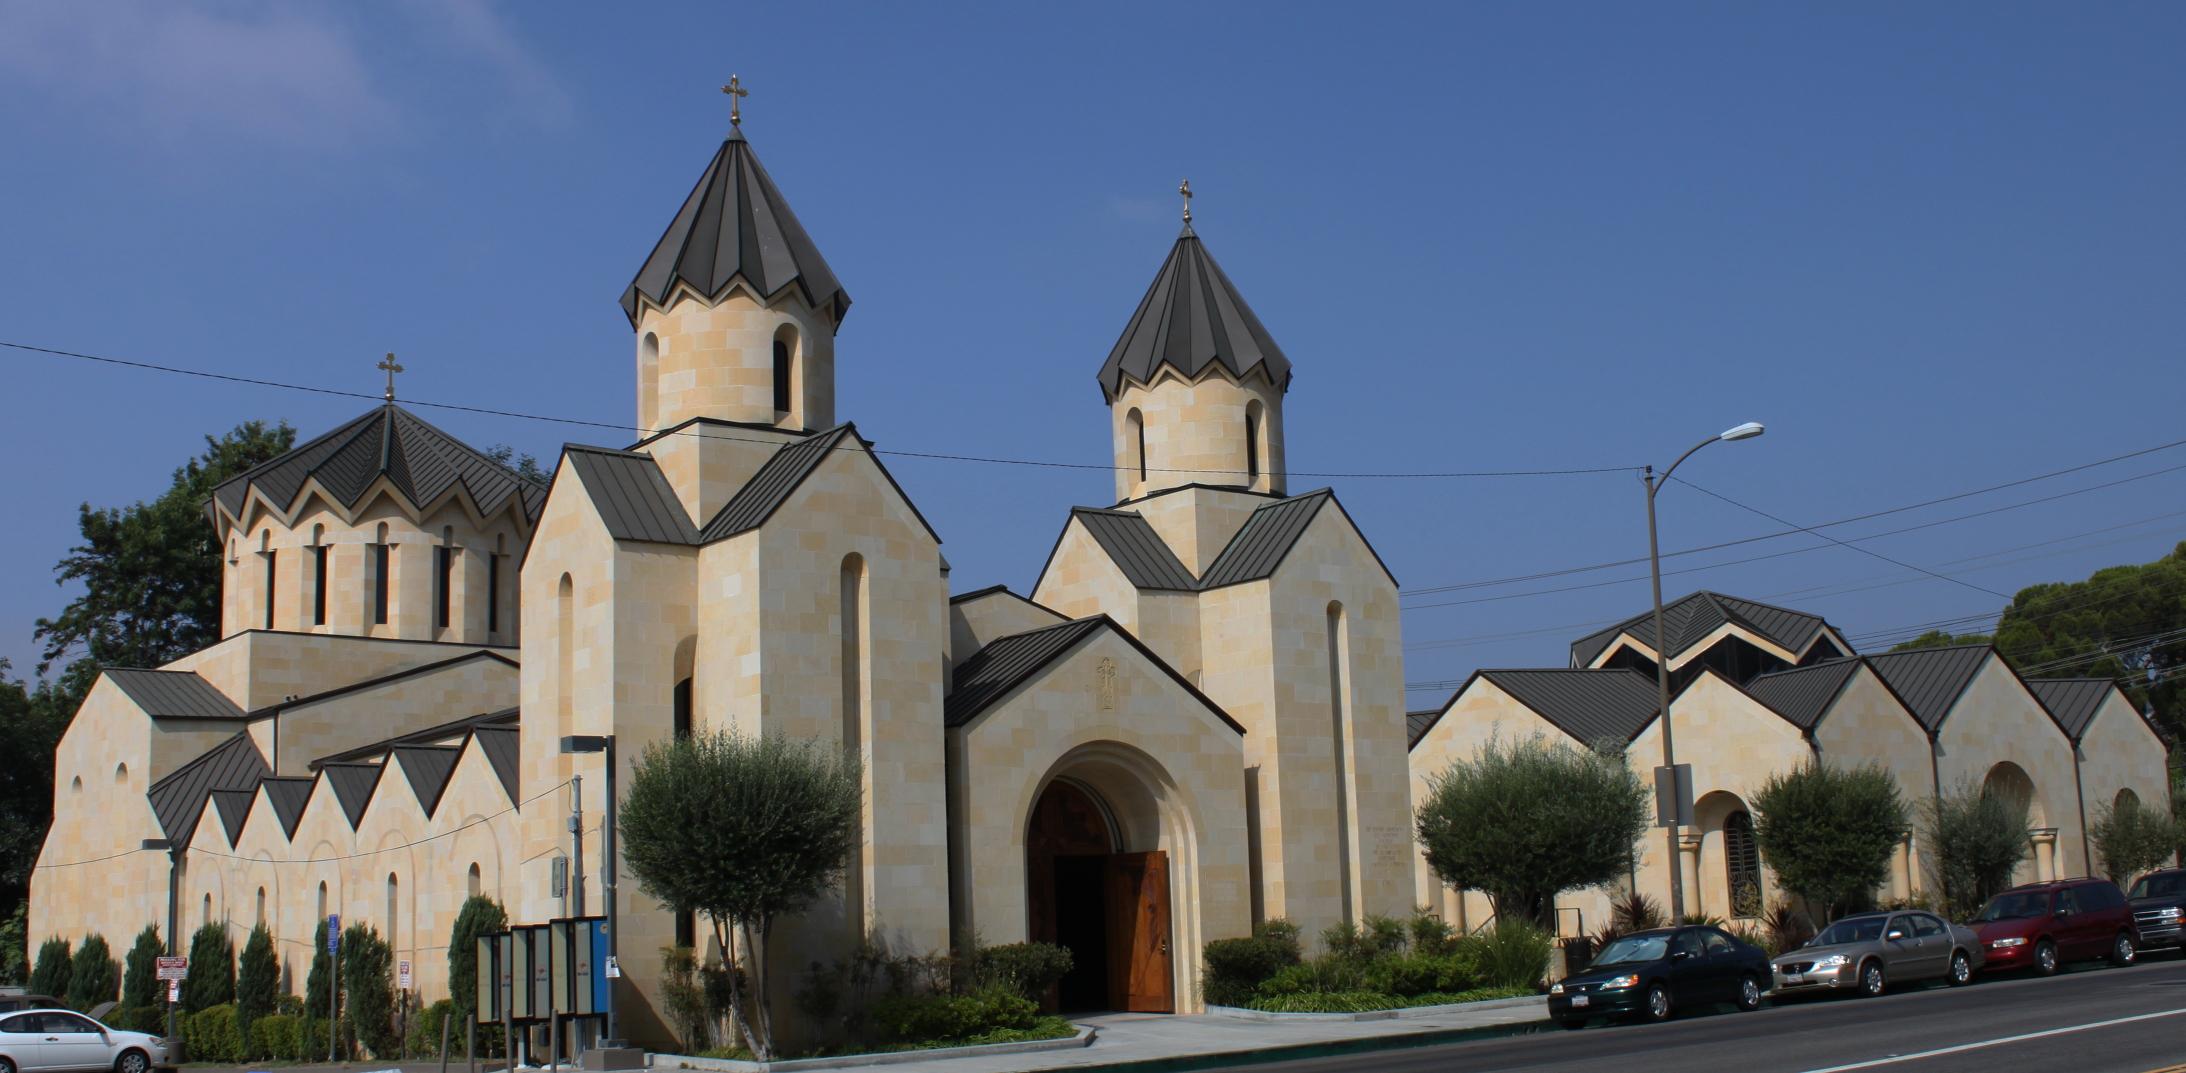 http://upload.wikimedia.org/wikipedia/commons/8/80/Saint_Gregory_the_Illuminator_Armenian_Catholic_Church_in_Glendale_,_California_(2001)_full.JPG